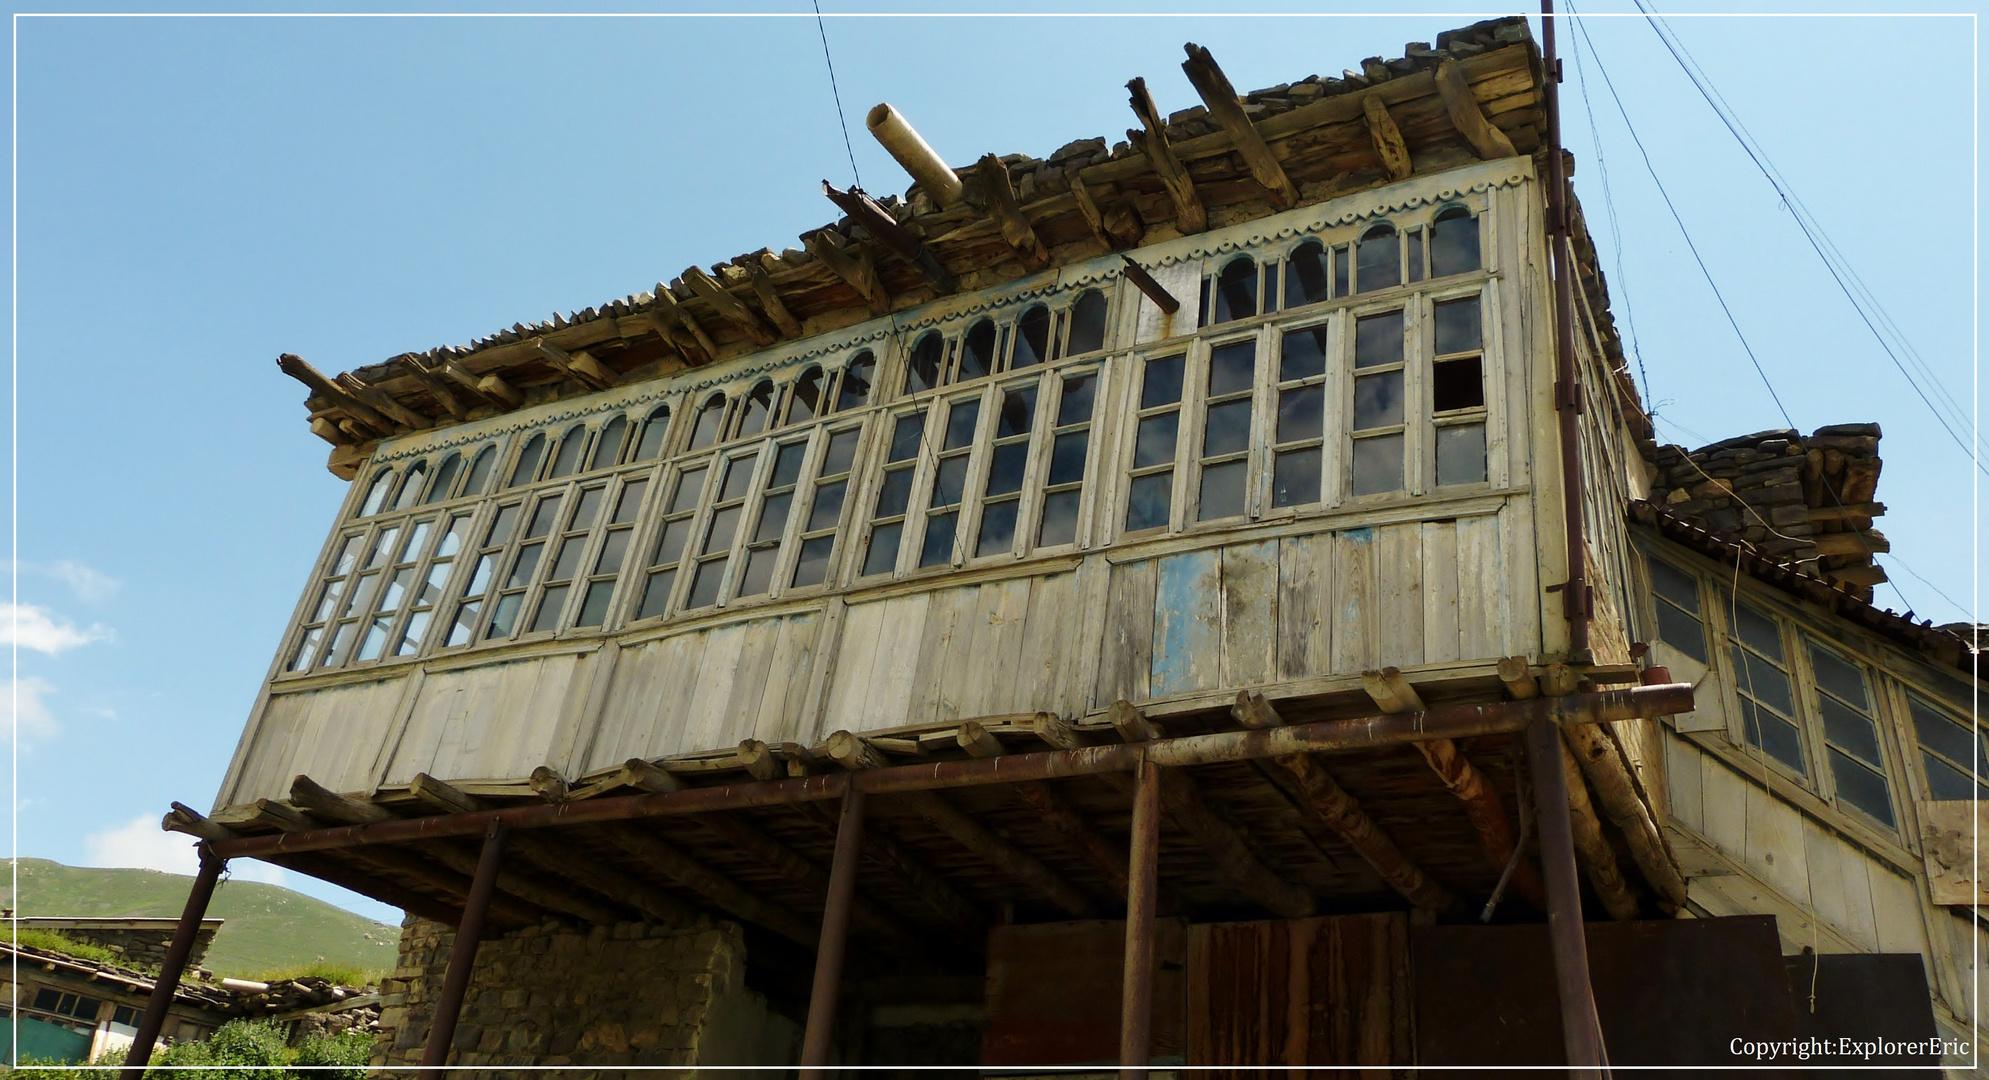 Holz-Architektur in Xinaliq..................